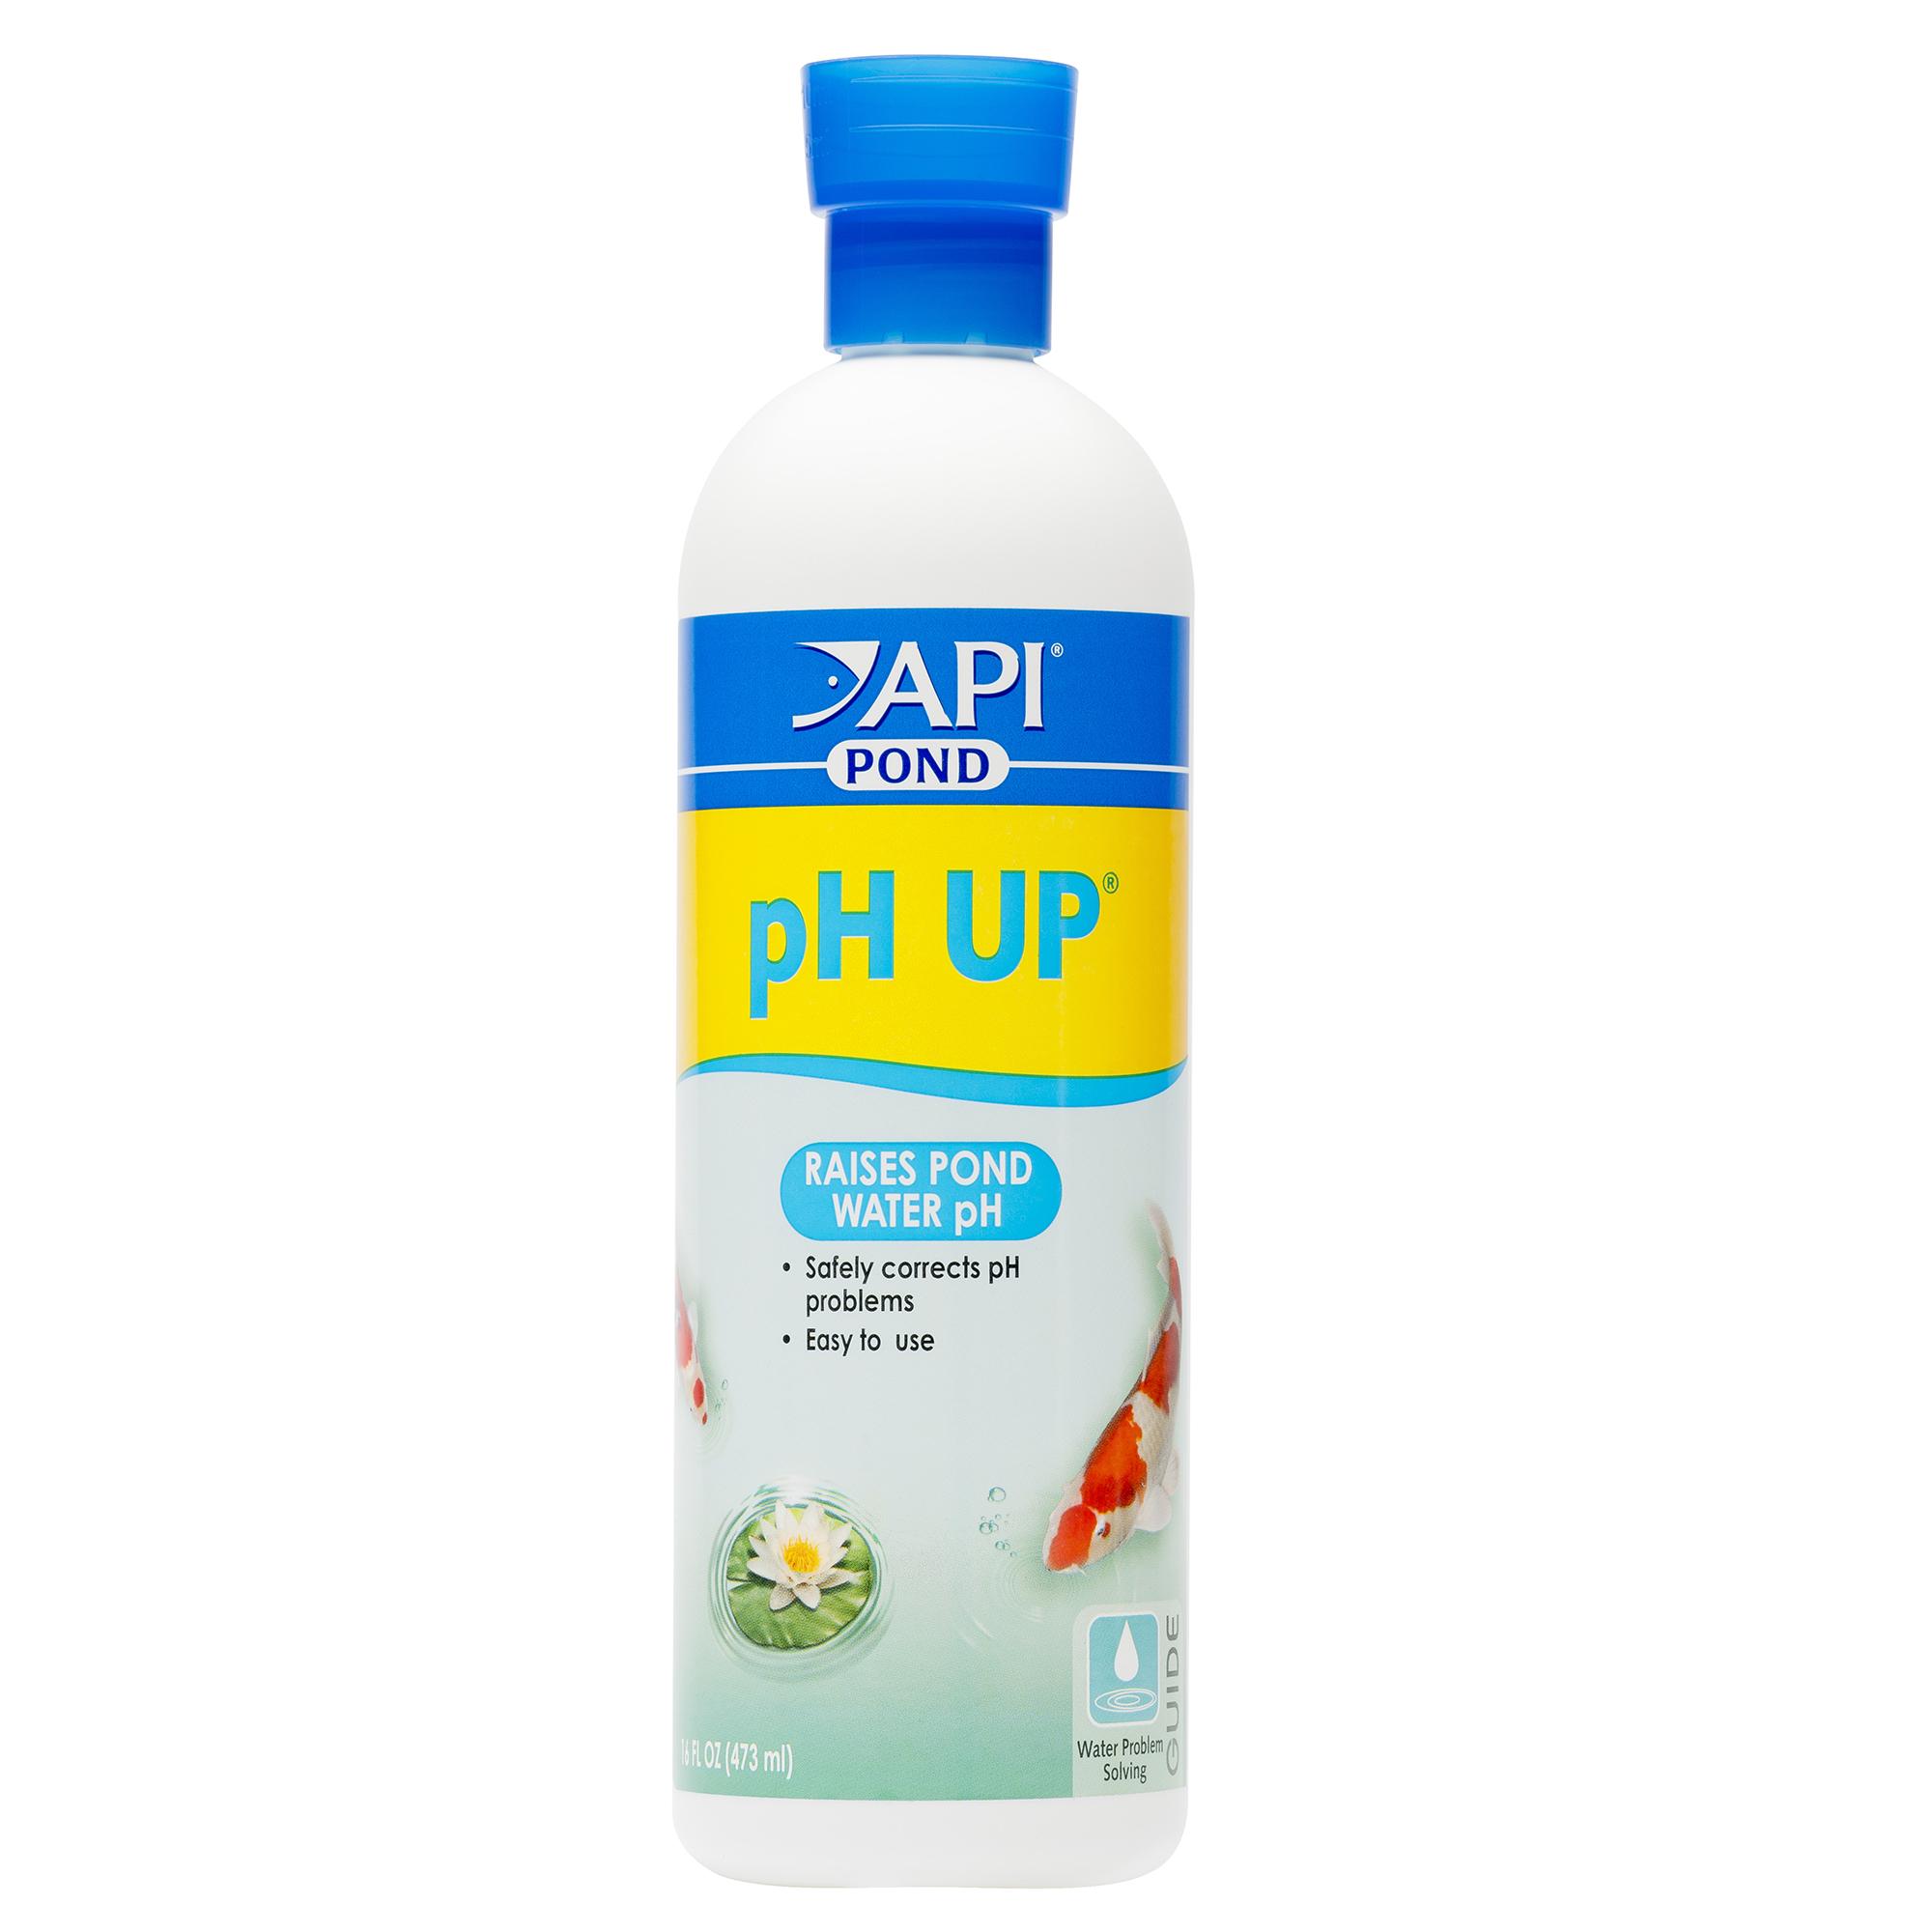 POND pH UP™